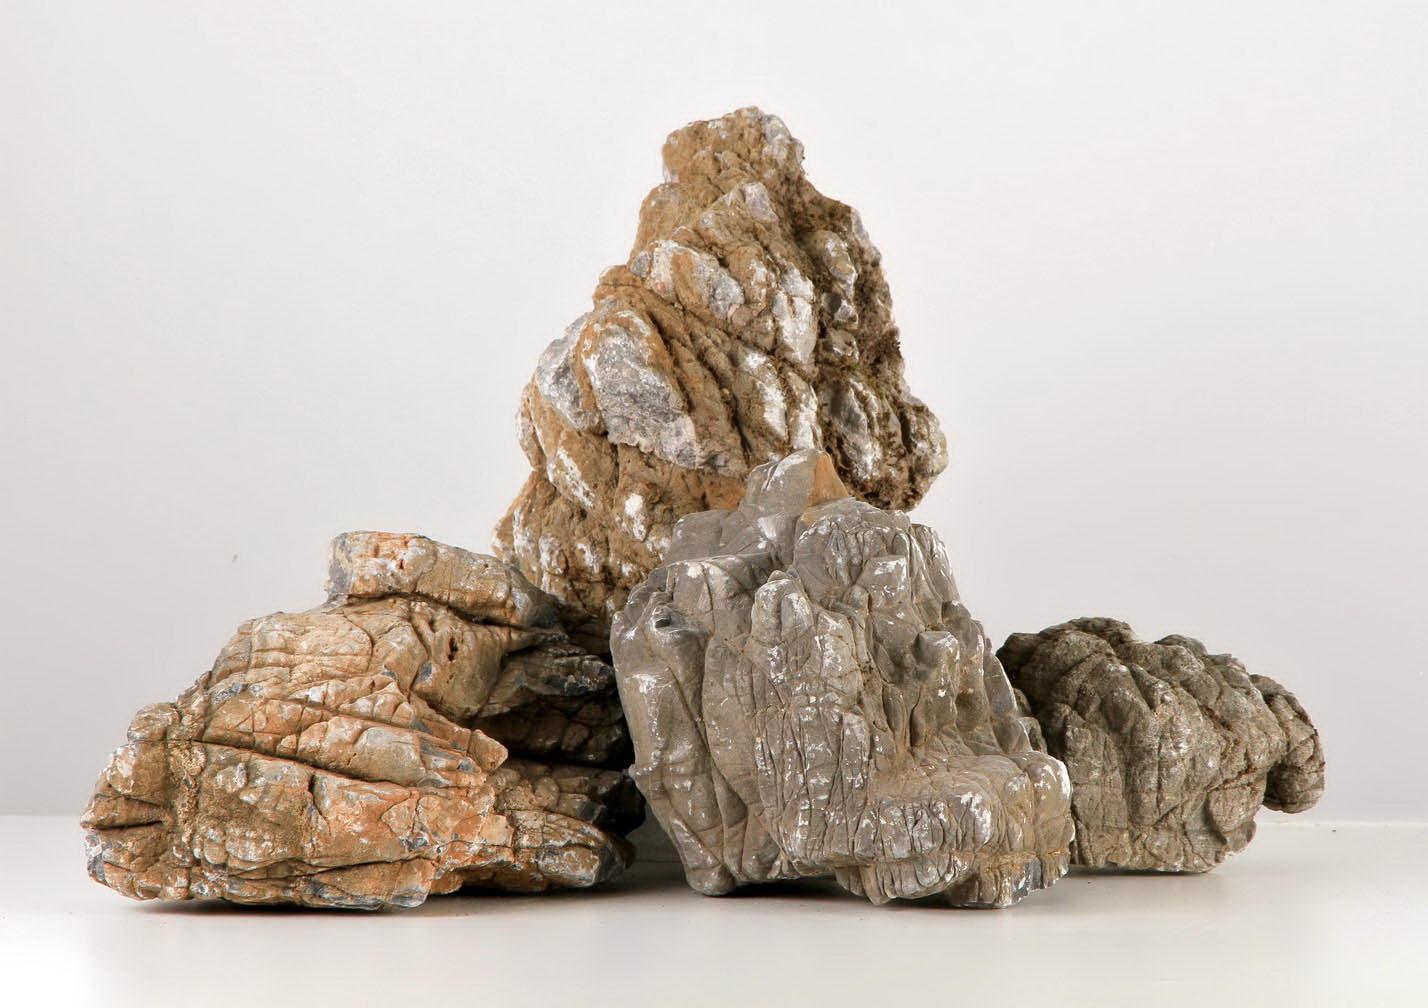 Rocks In An Aquascape